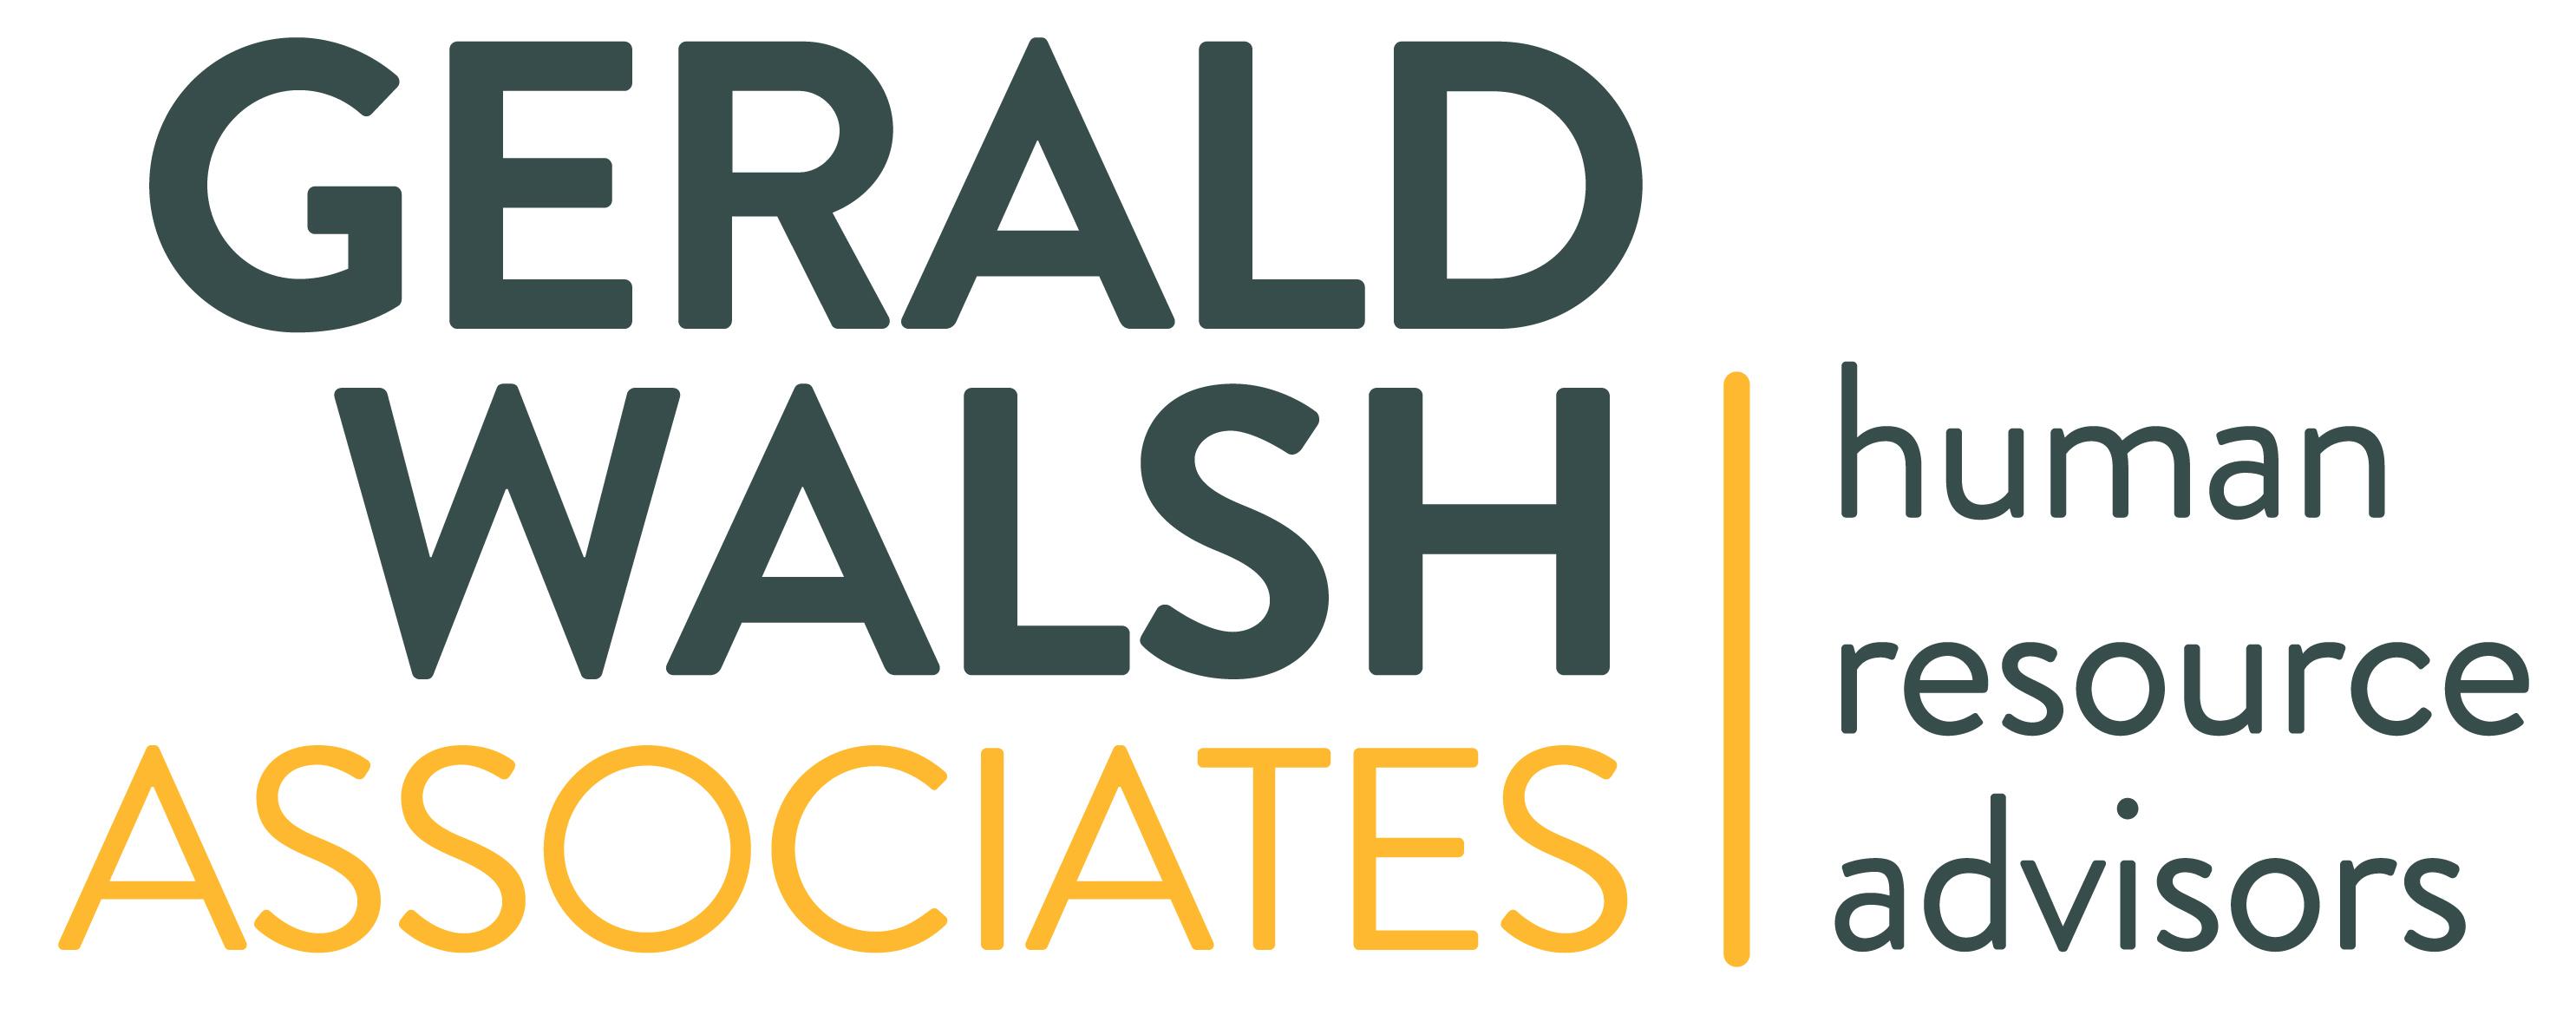 Gerald Walsh Associates Inc.'s Logo